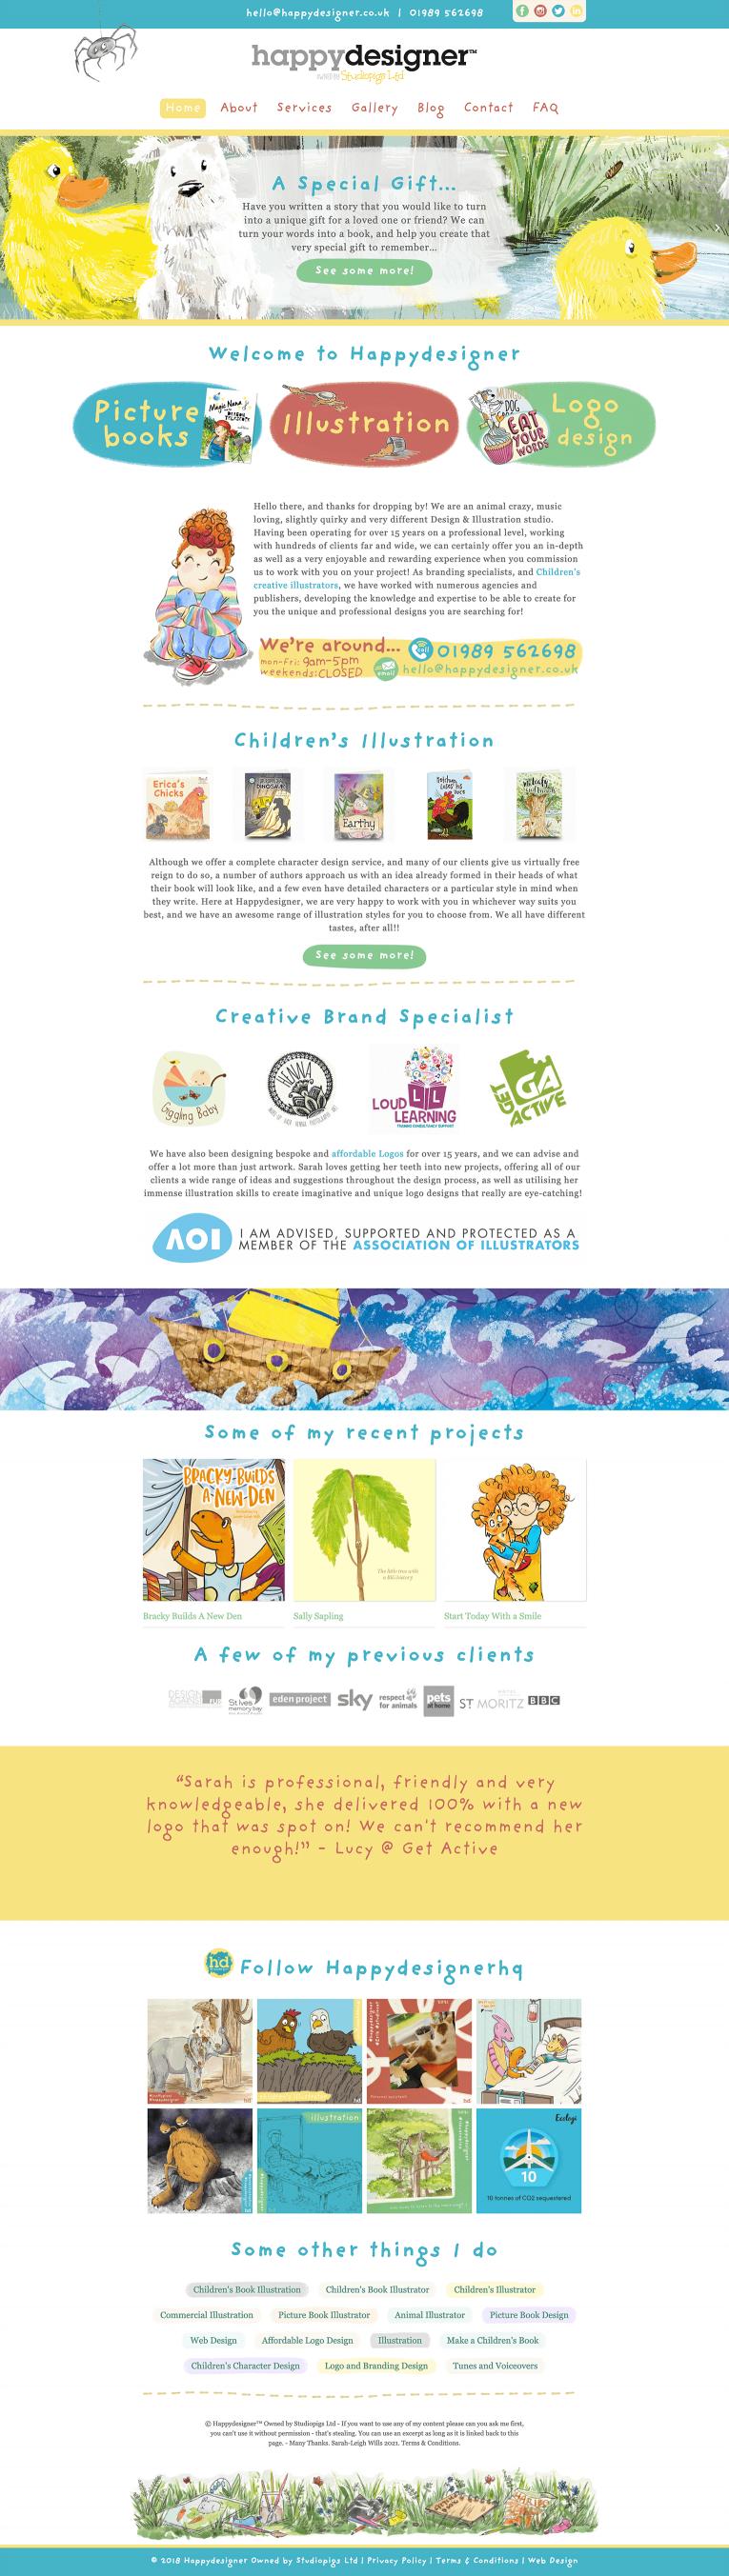 Happy Designer Home Page